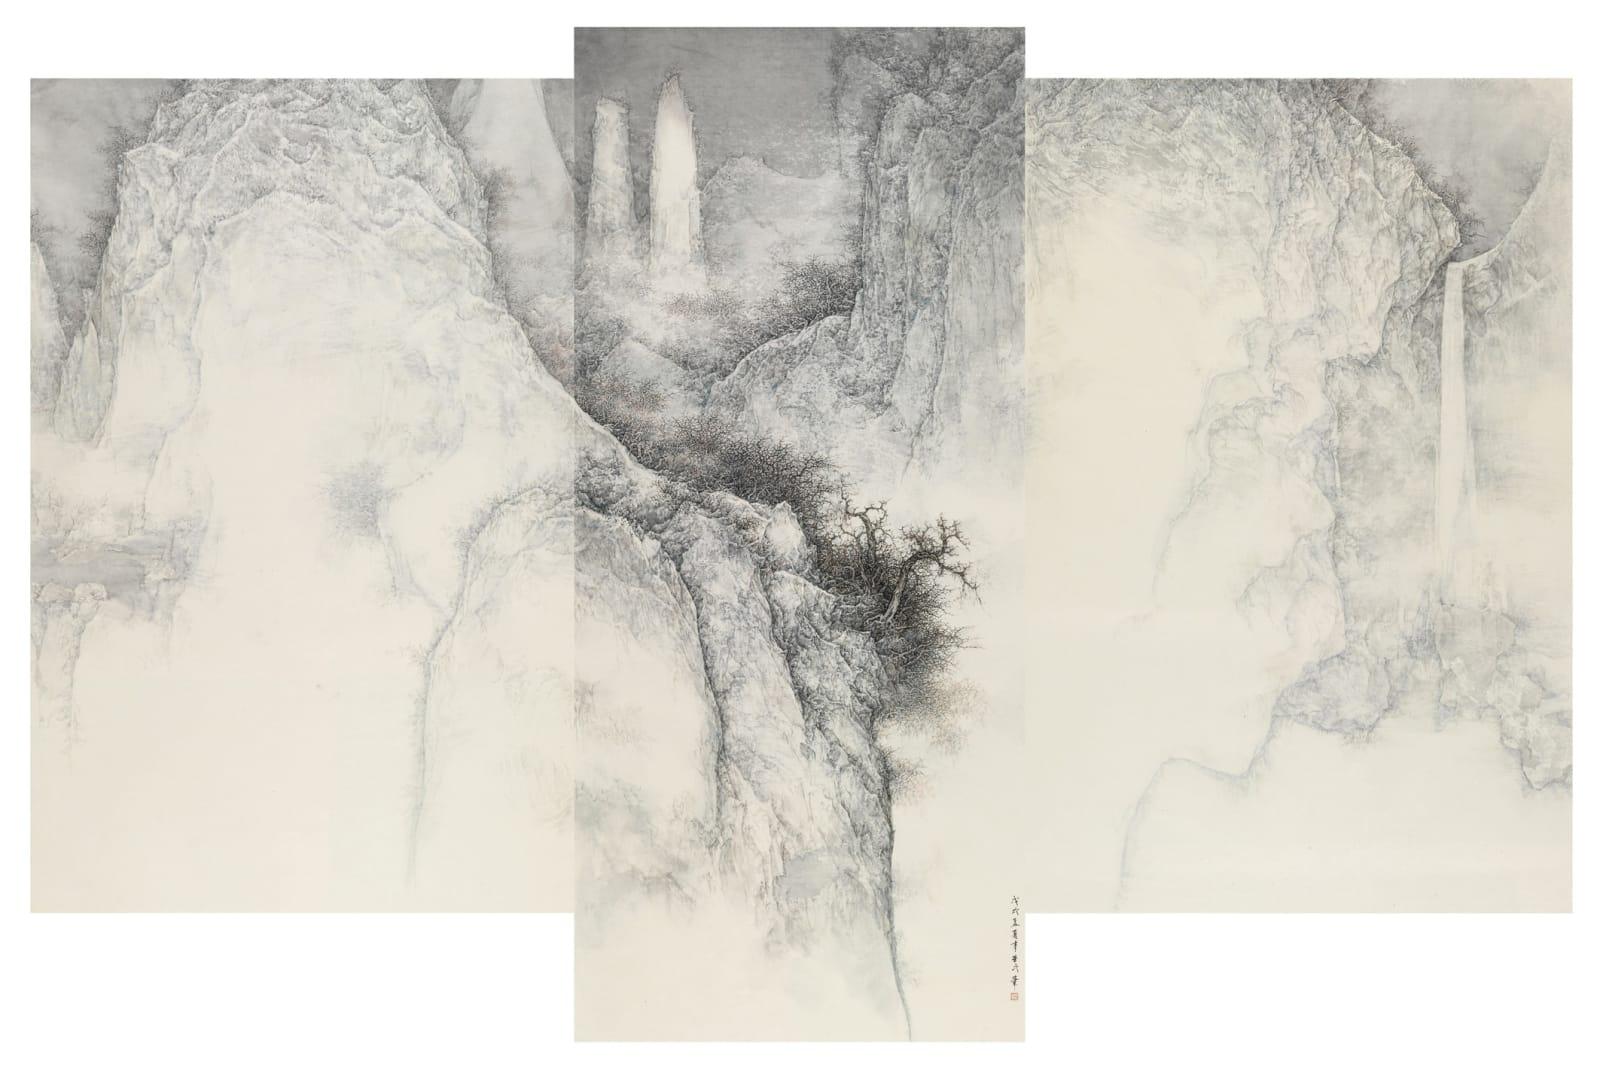 Li Huayi 李華弌, Zen of Winter《冬之禪》, 2019